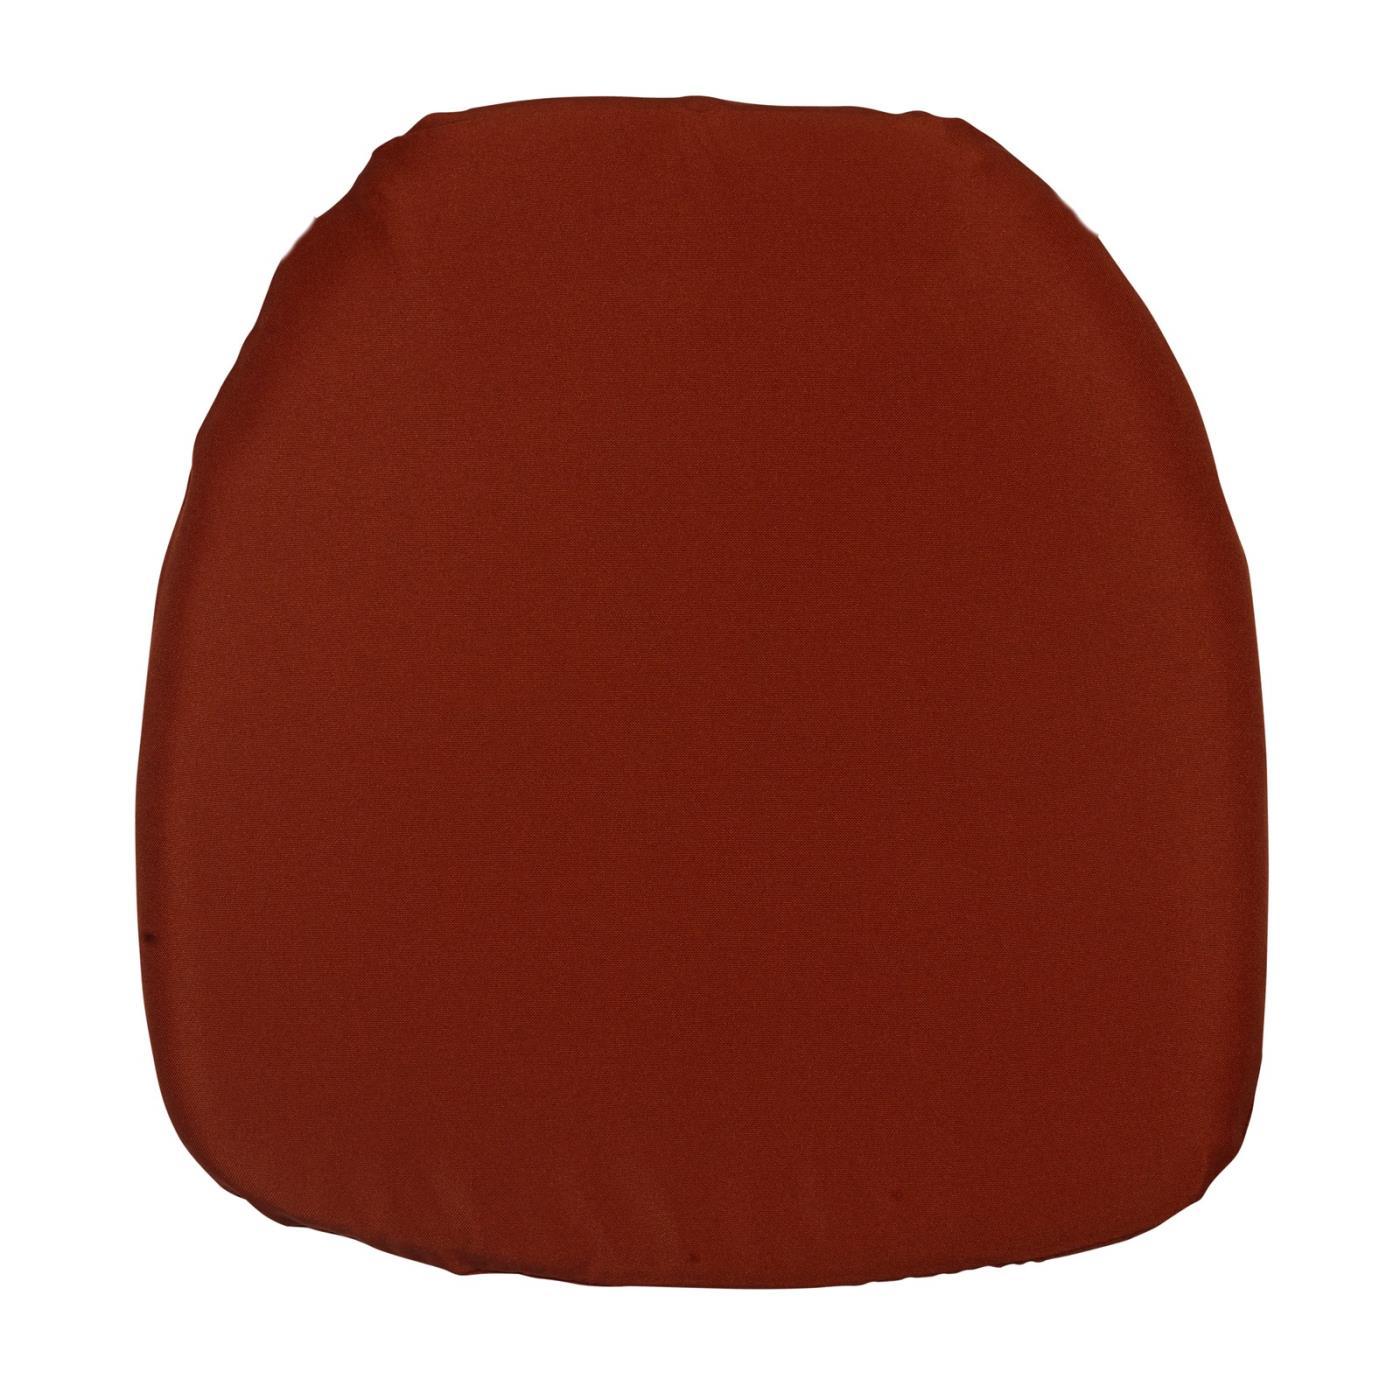 Poly Seat Cushion - Terra Cotta